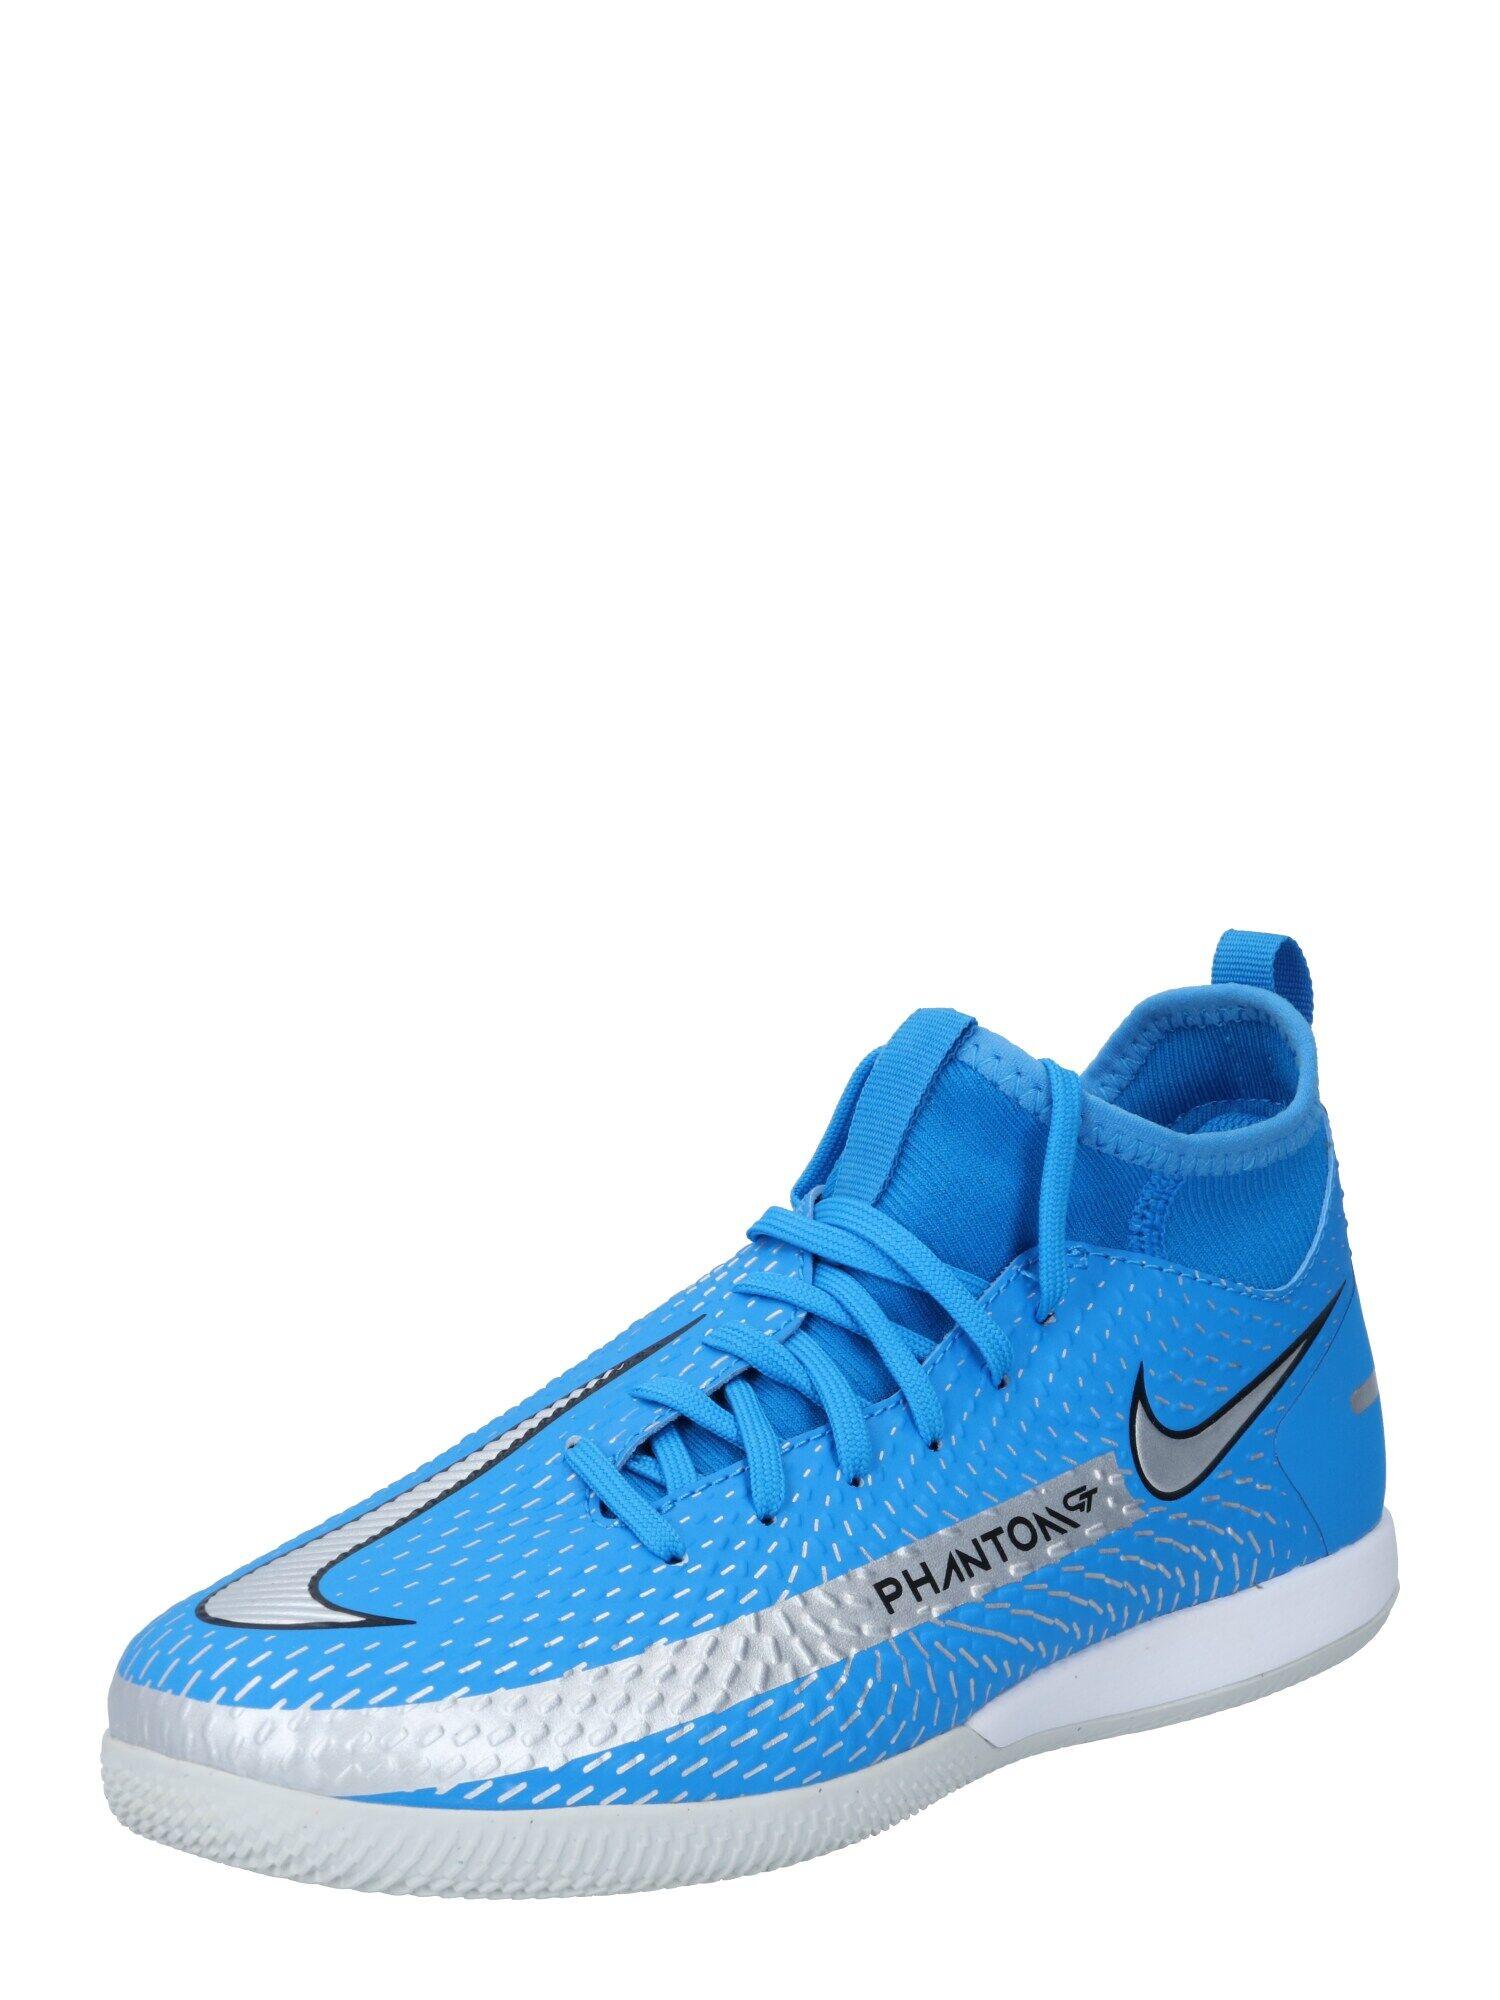 NIKE Chaussure de sport 'Phantom GT Academy'  - Bleu - Taille: 1.5Y - boy